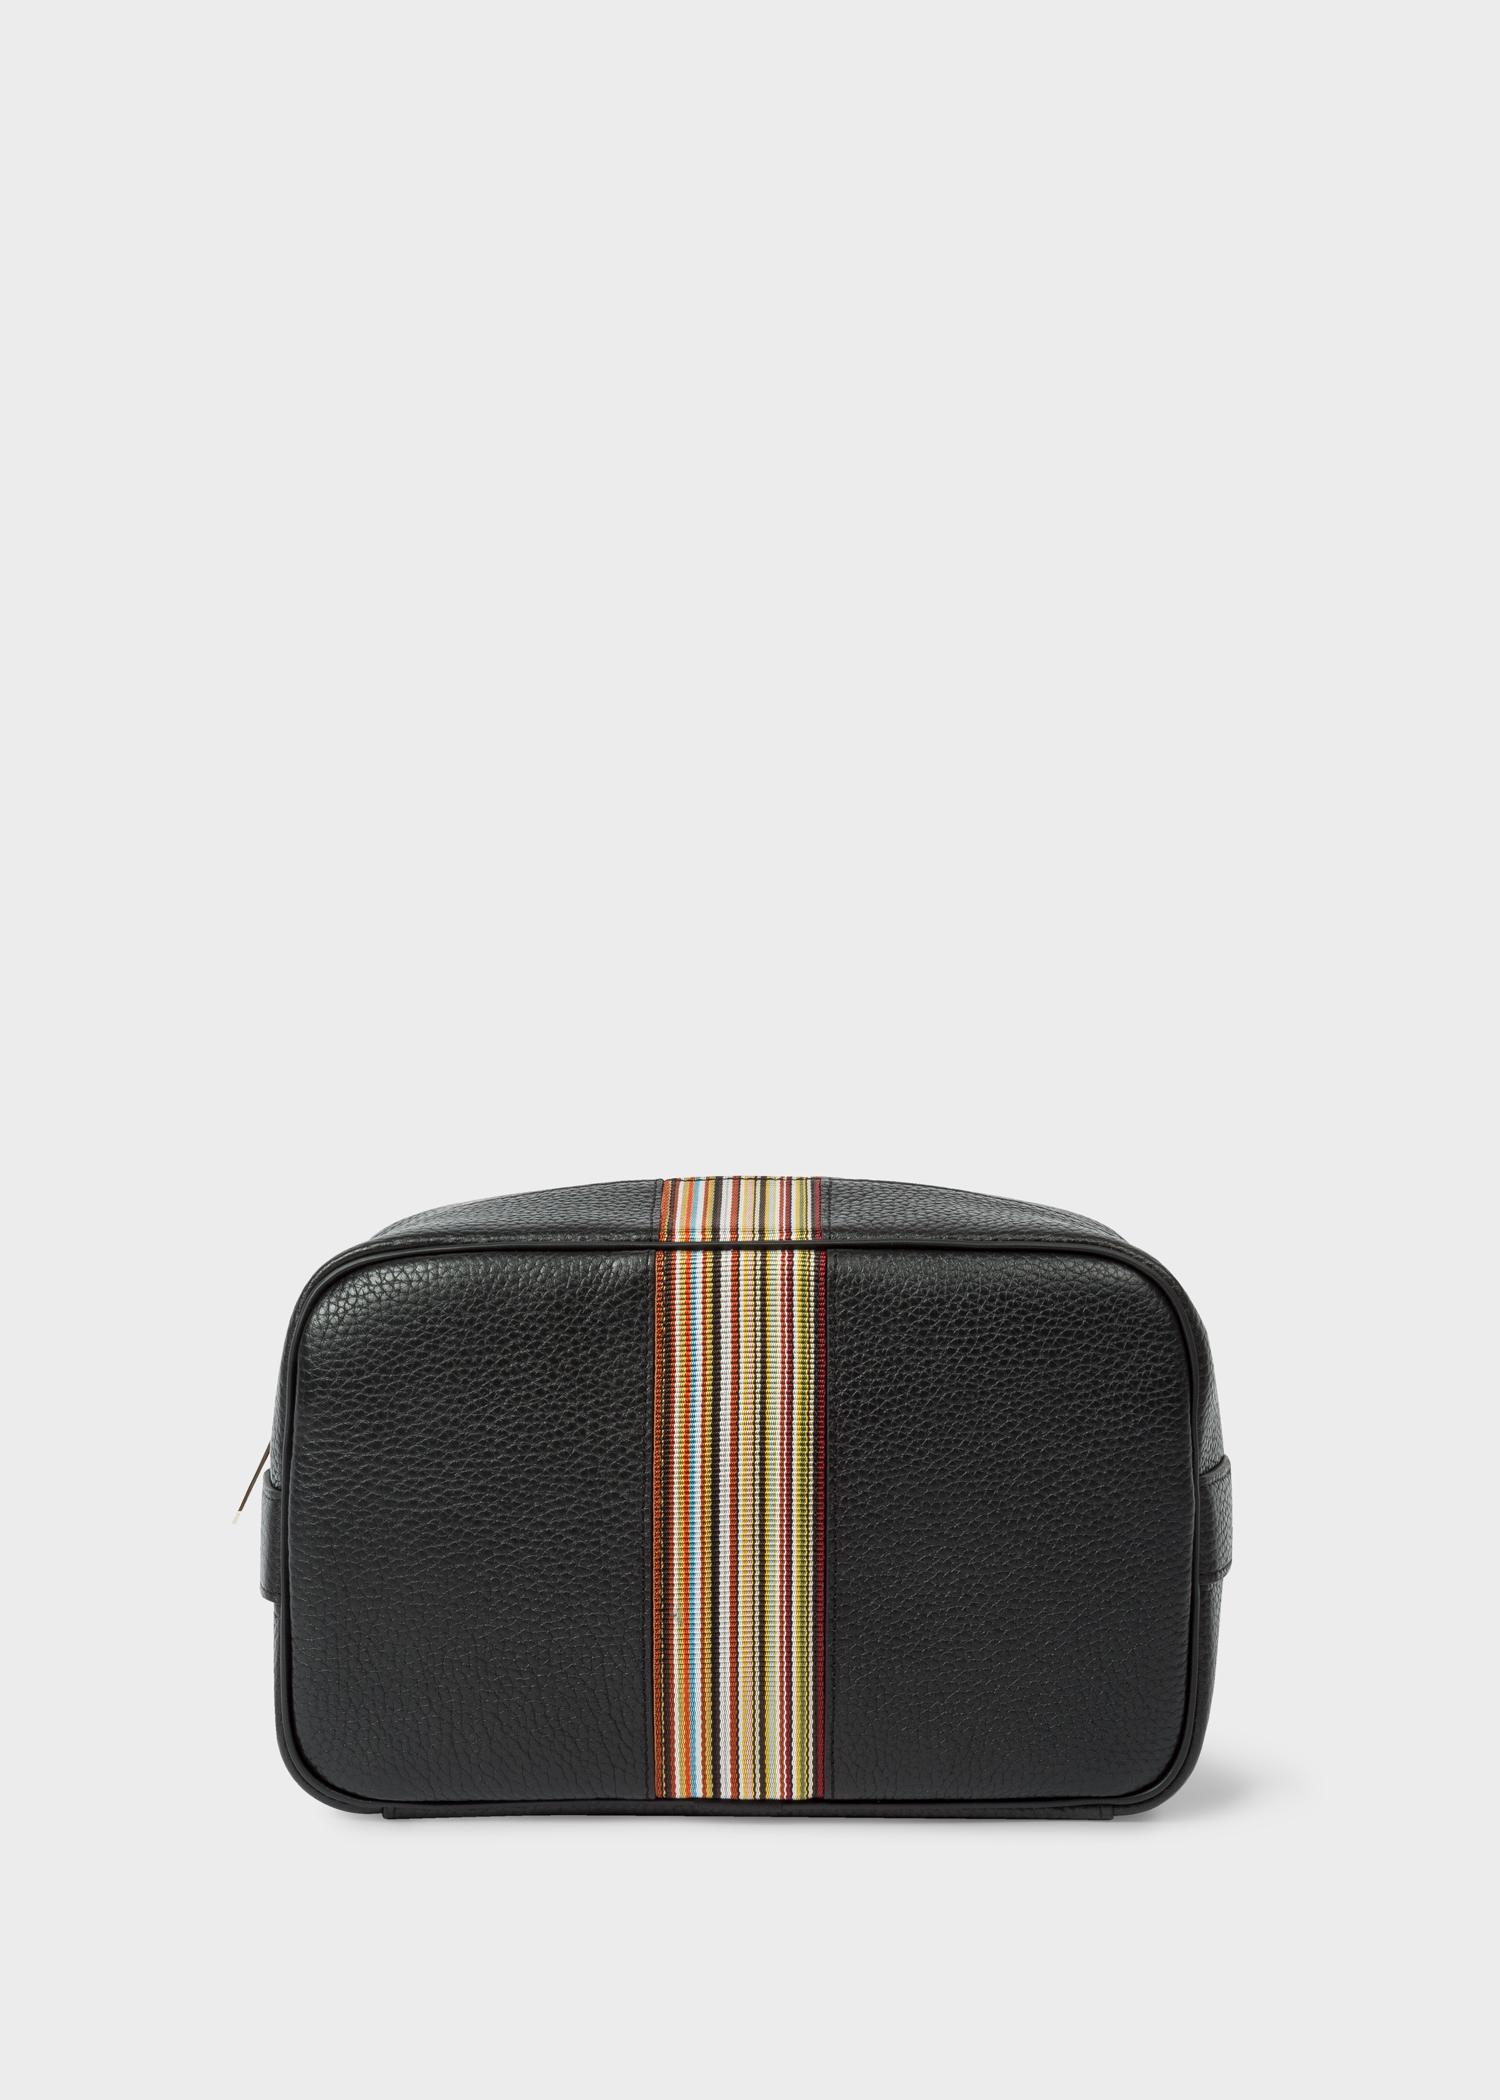 11803ac72 Men's Black Leather Signature Stripe Wash Bag - Paul Smith US